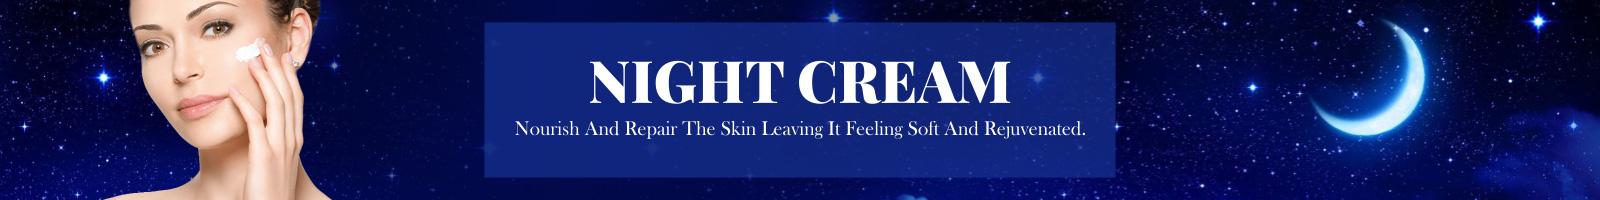 Night Care Creams